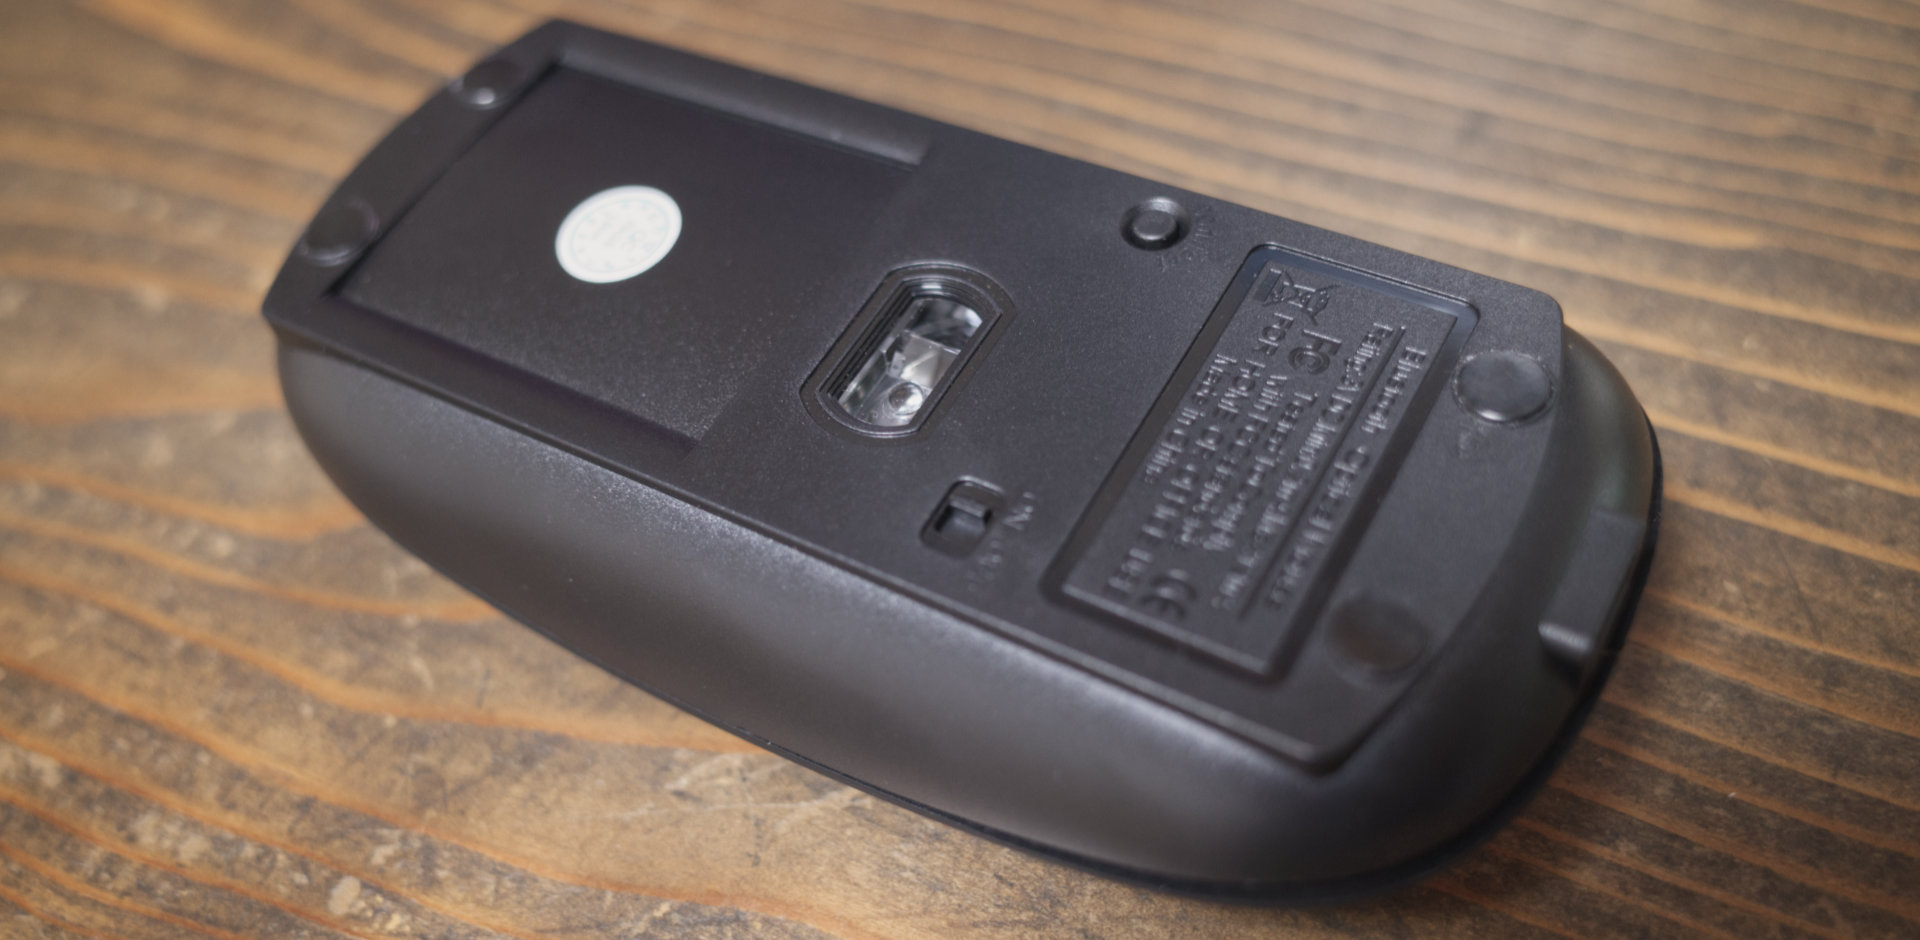 Bluetooth ワイヤレスマウス「Scheki 」のbottom